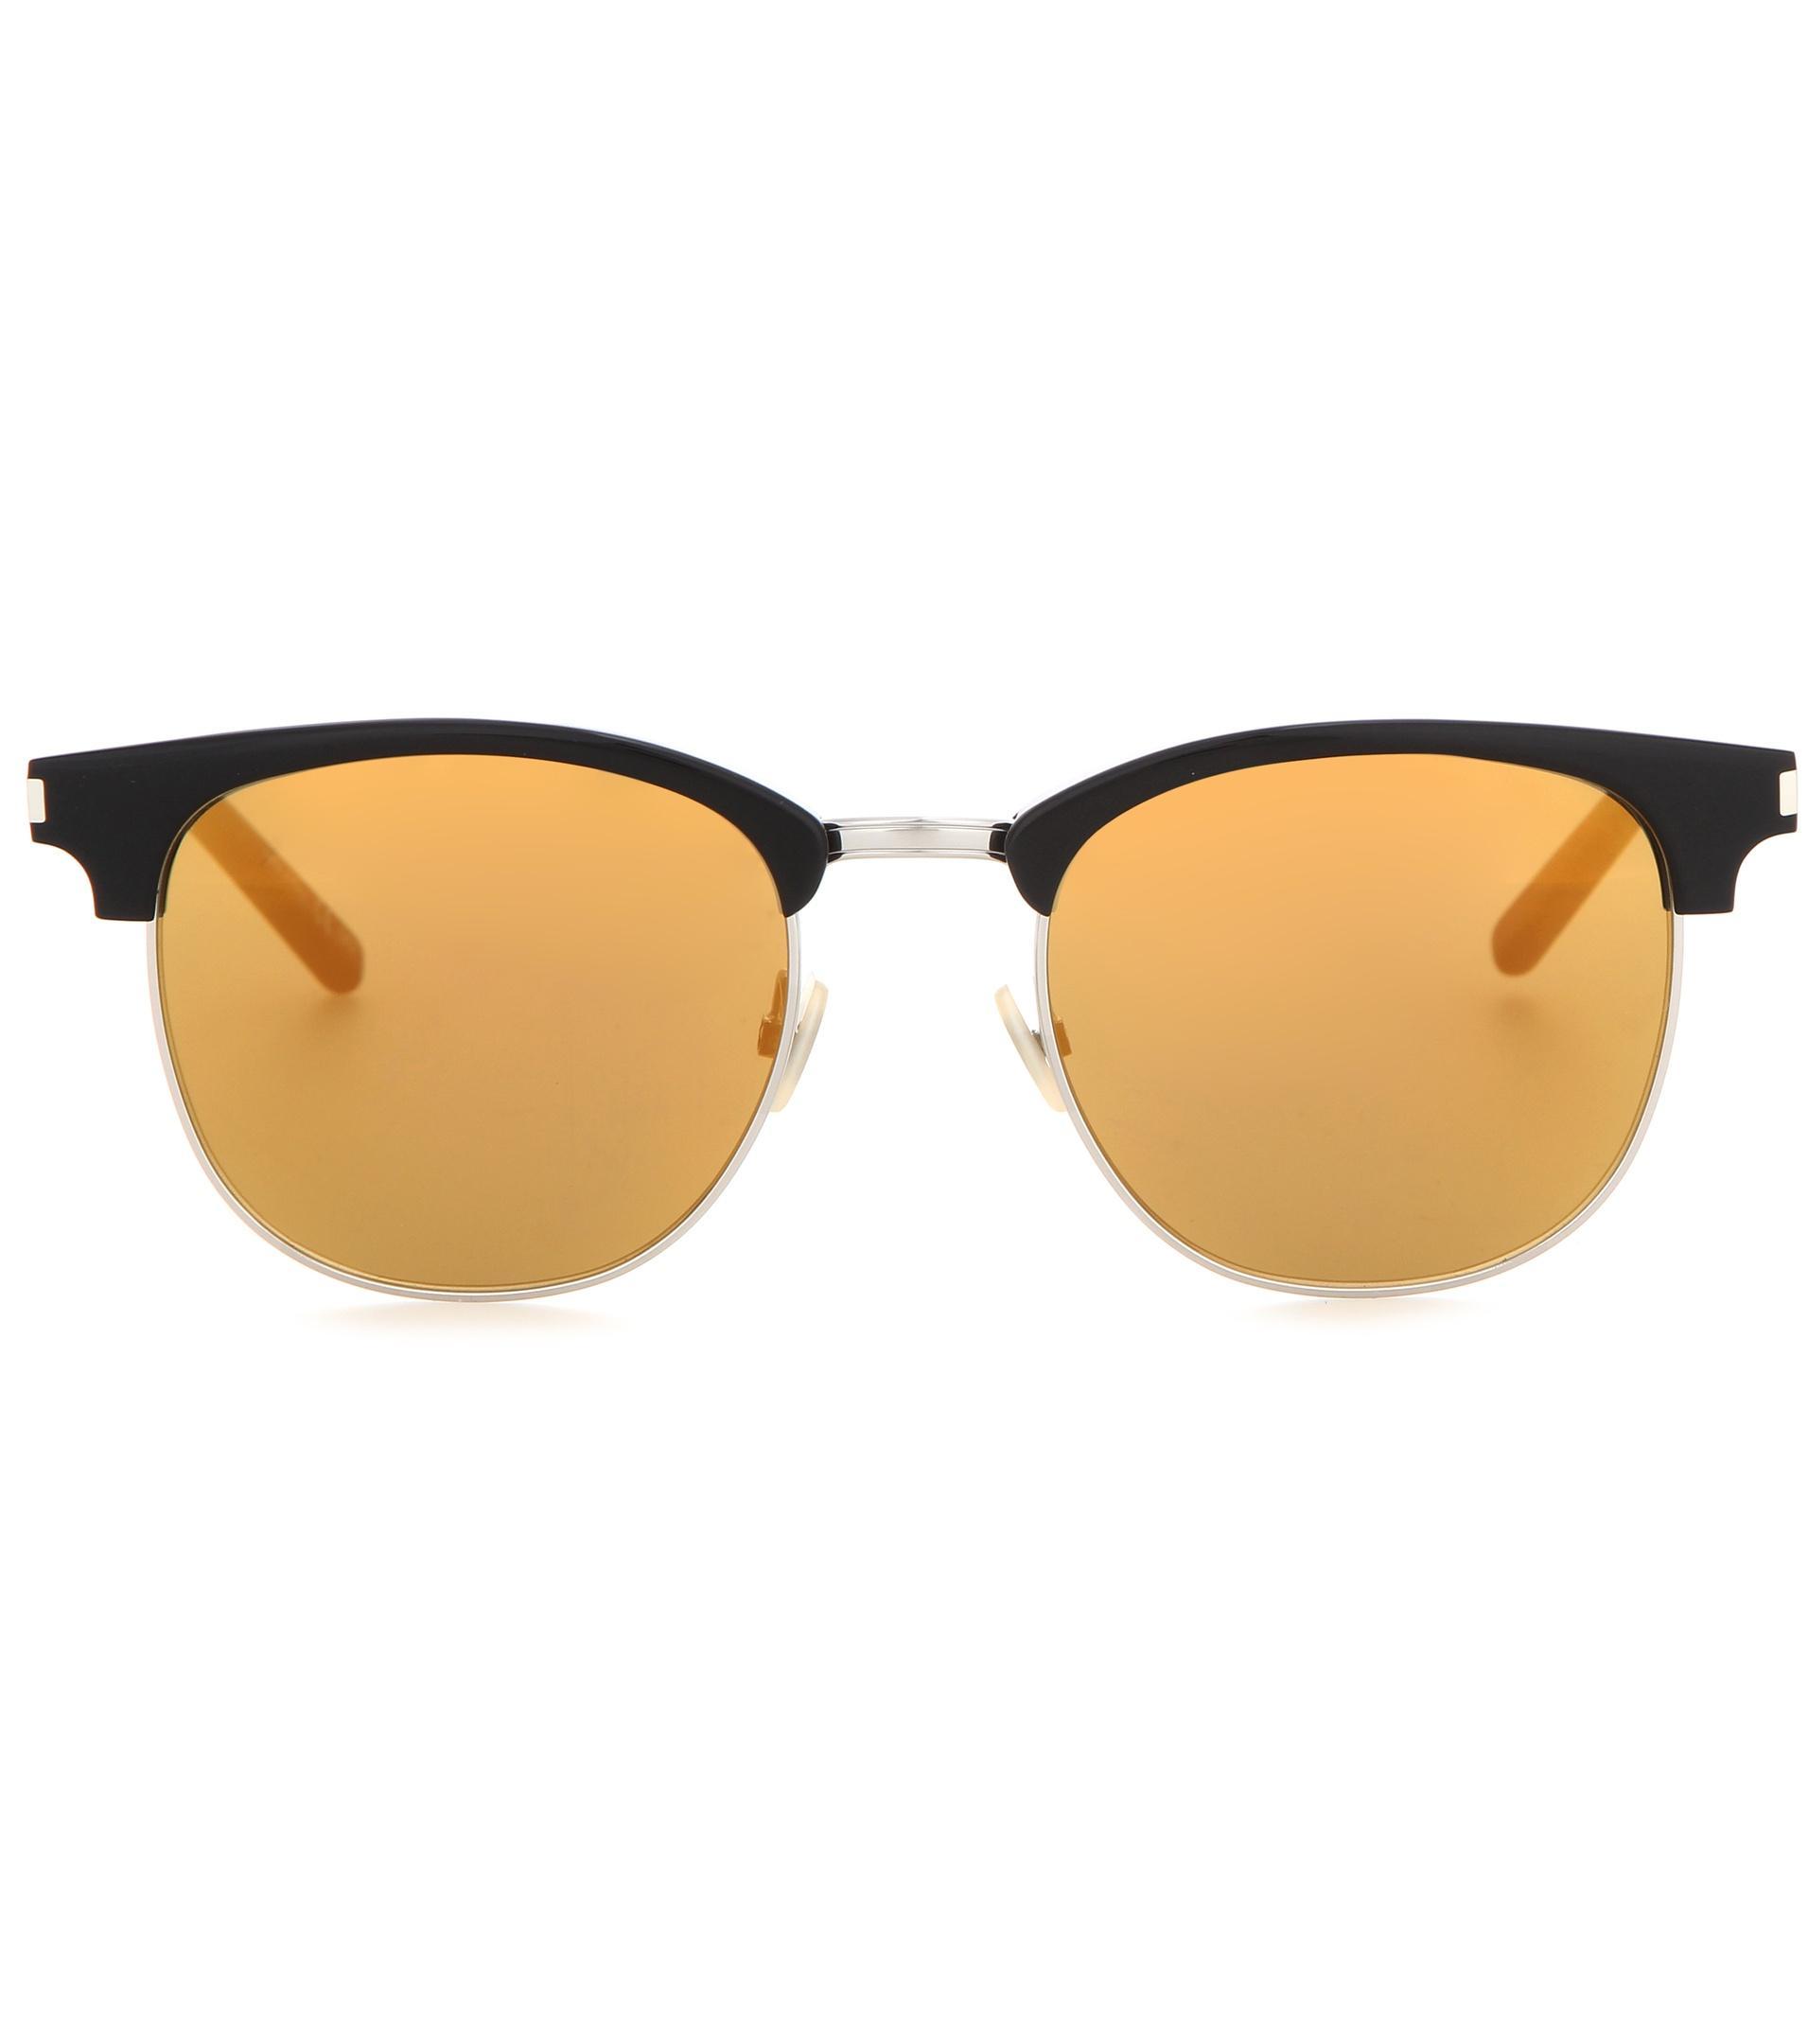 25a8fb9ad51 Lyst - Saint Laurent Sl 108 Surf 52 Mirrored Sunglasses in Metallic